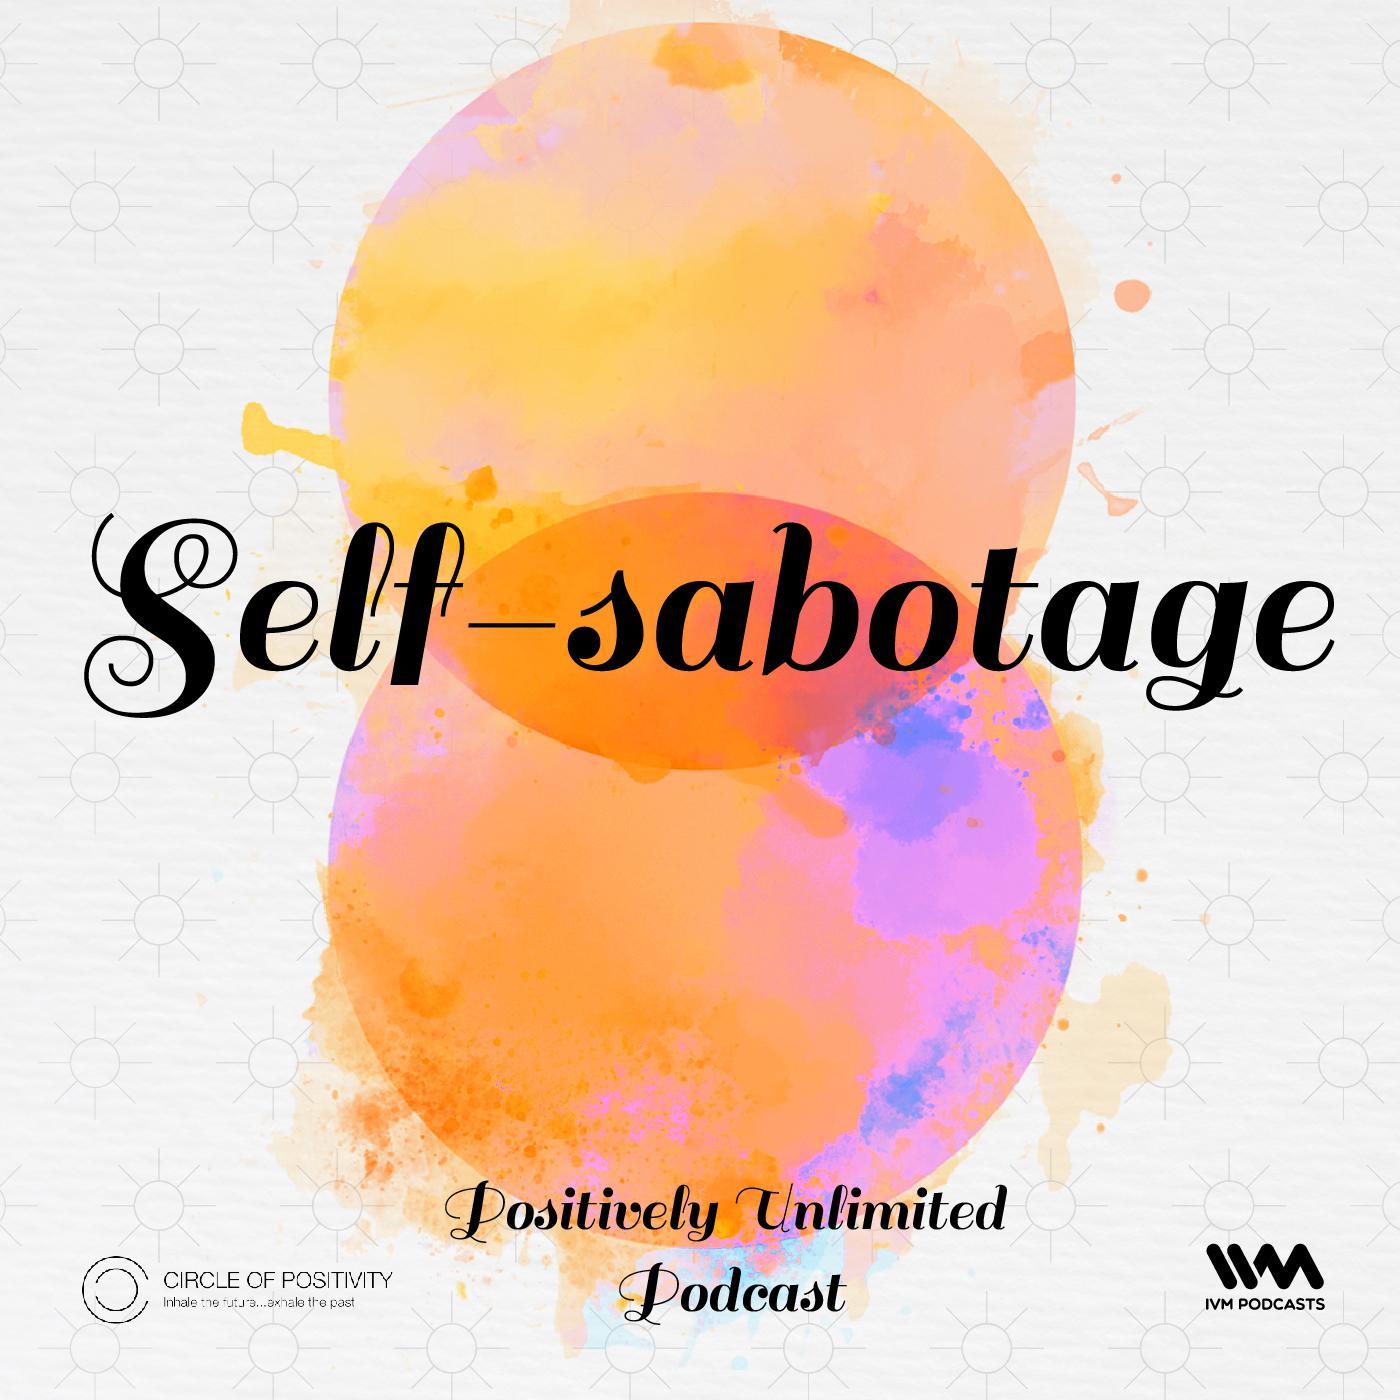 Ep. 117: Self-sabotage